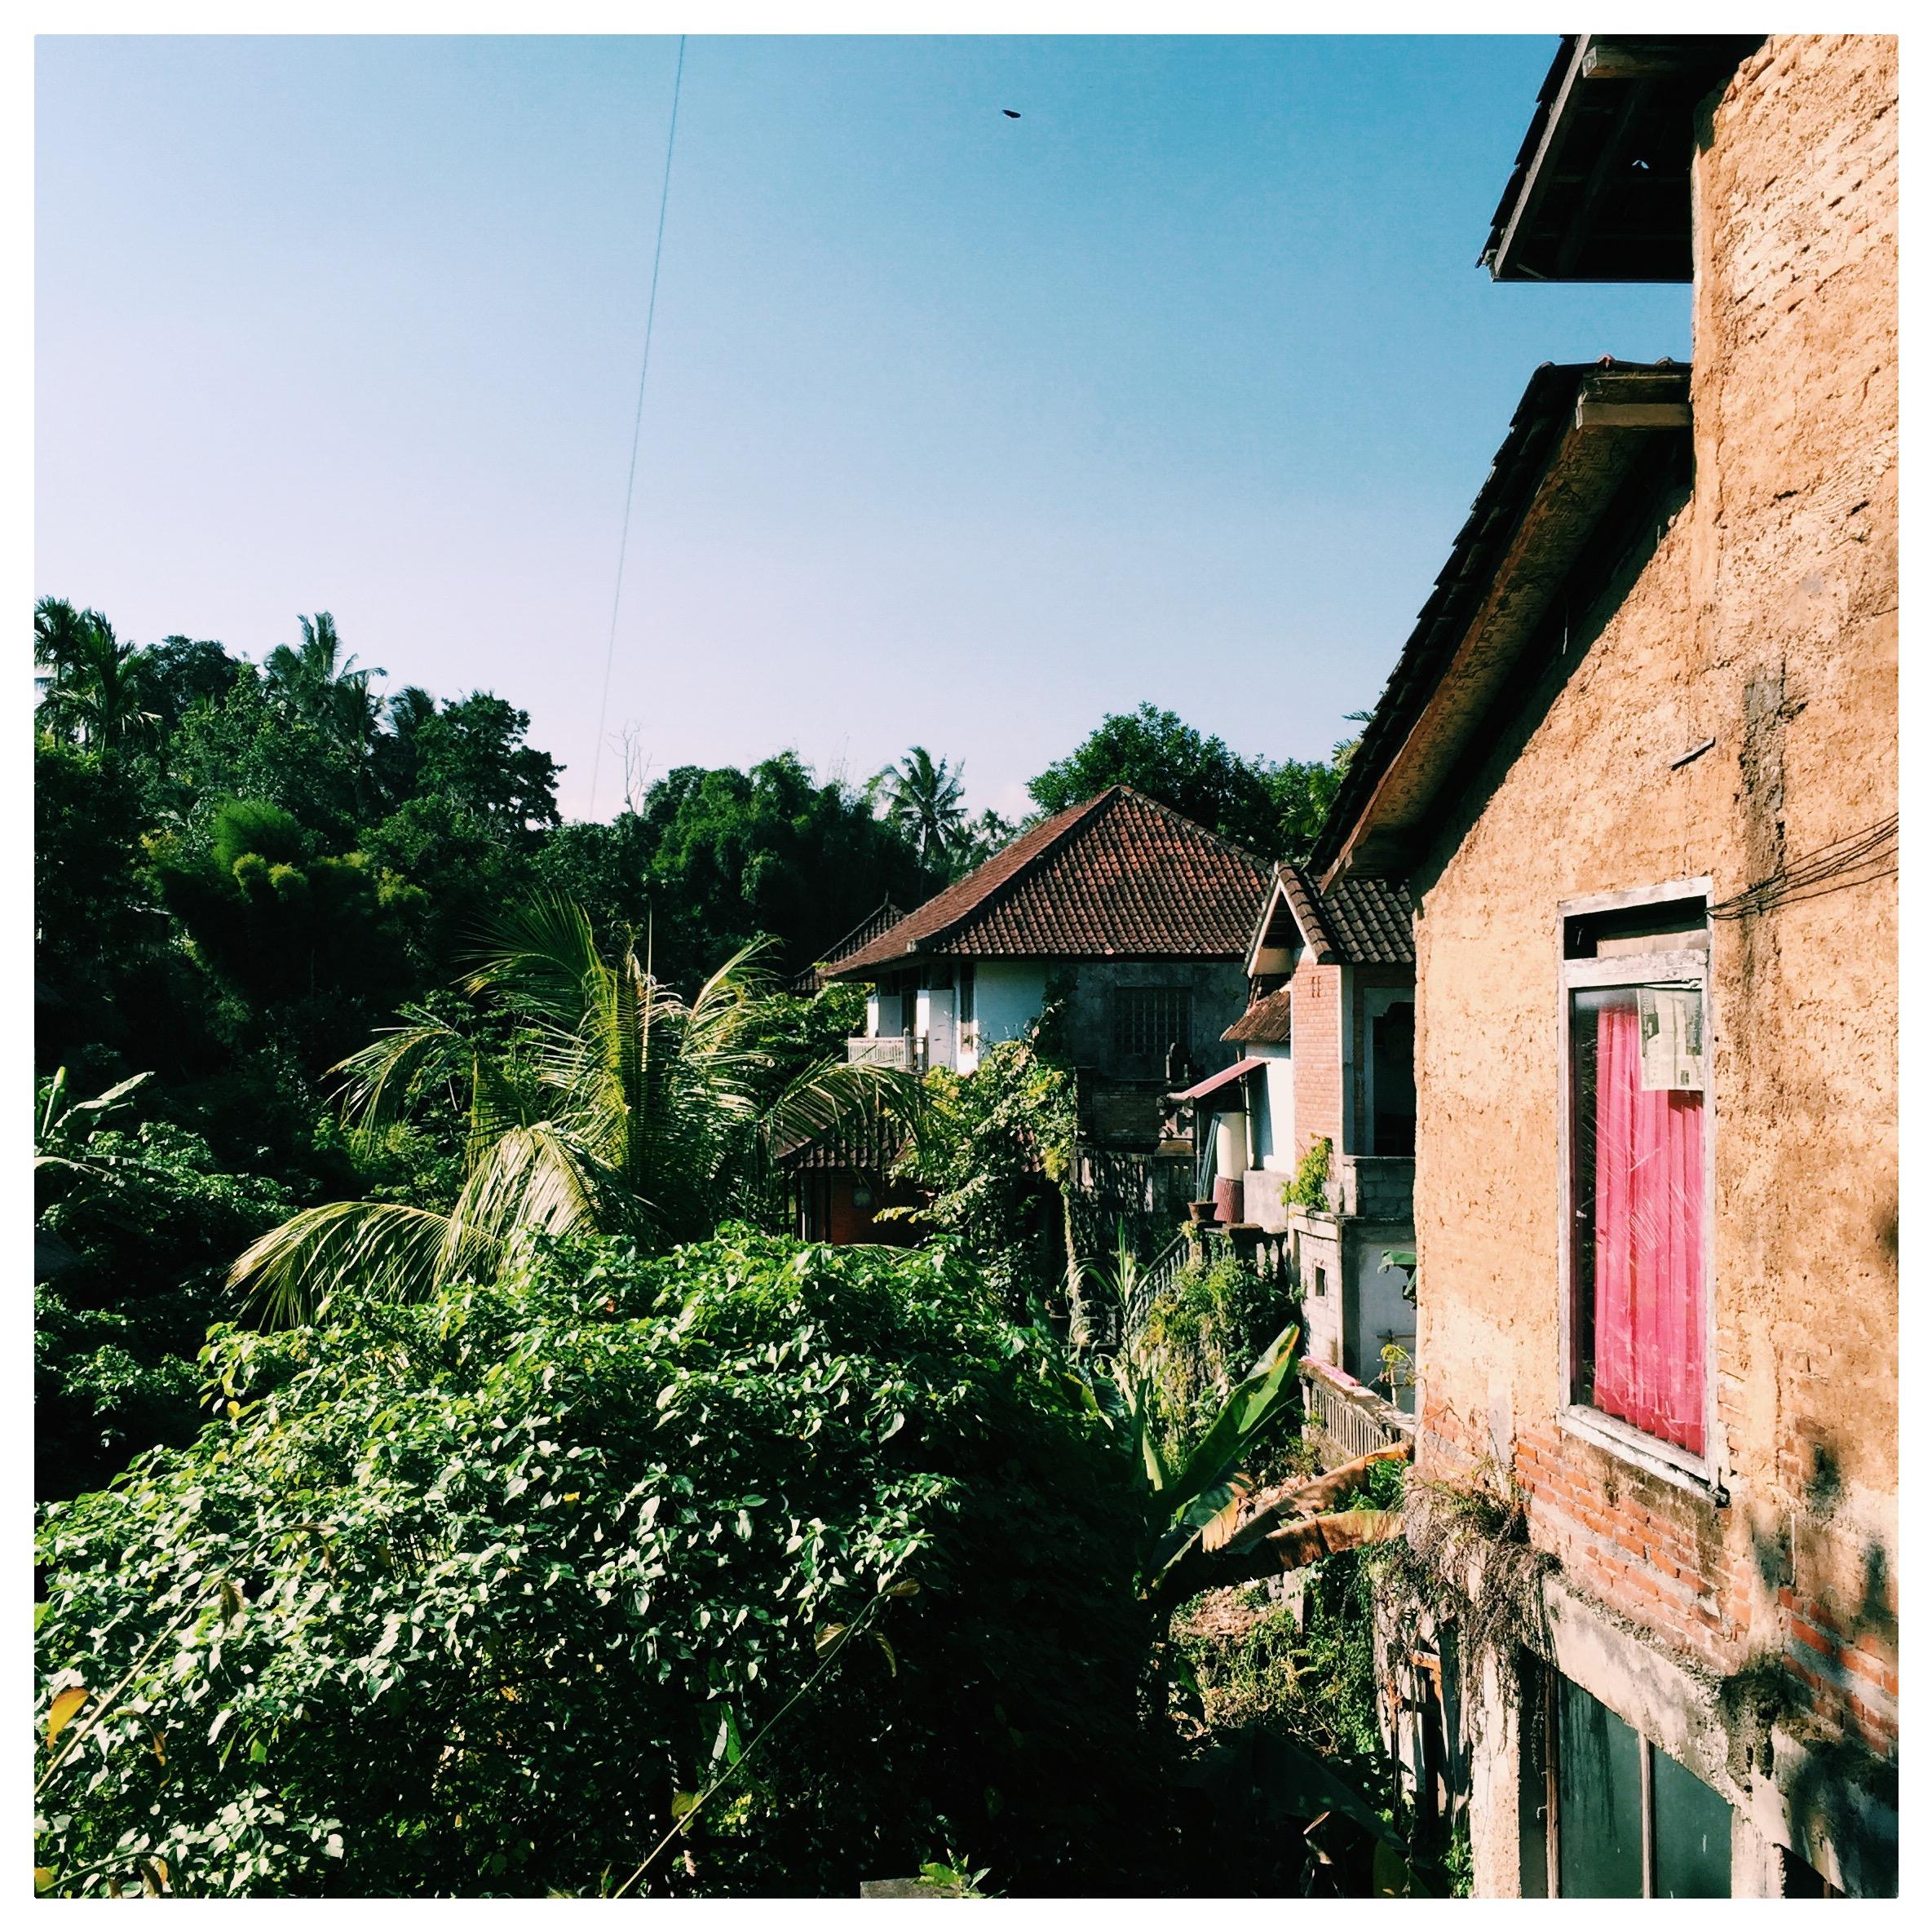 View in Ubud